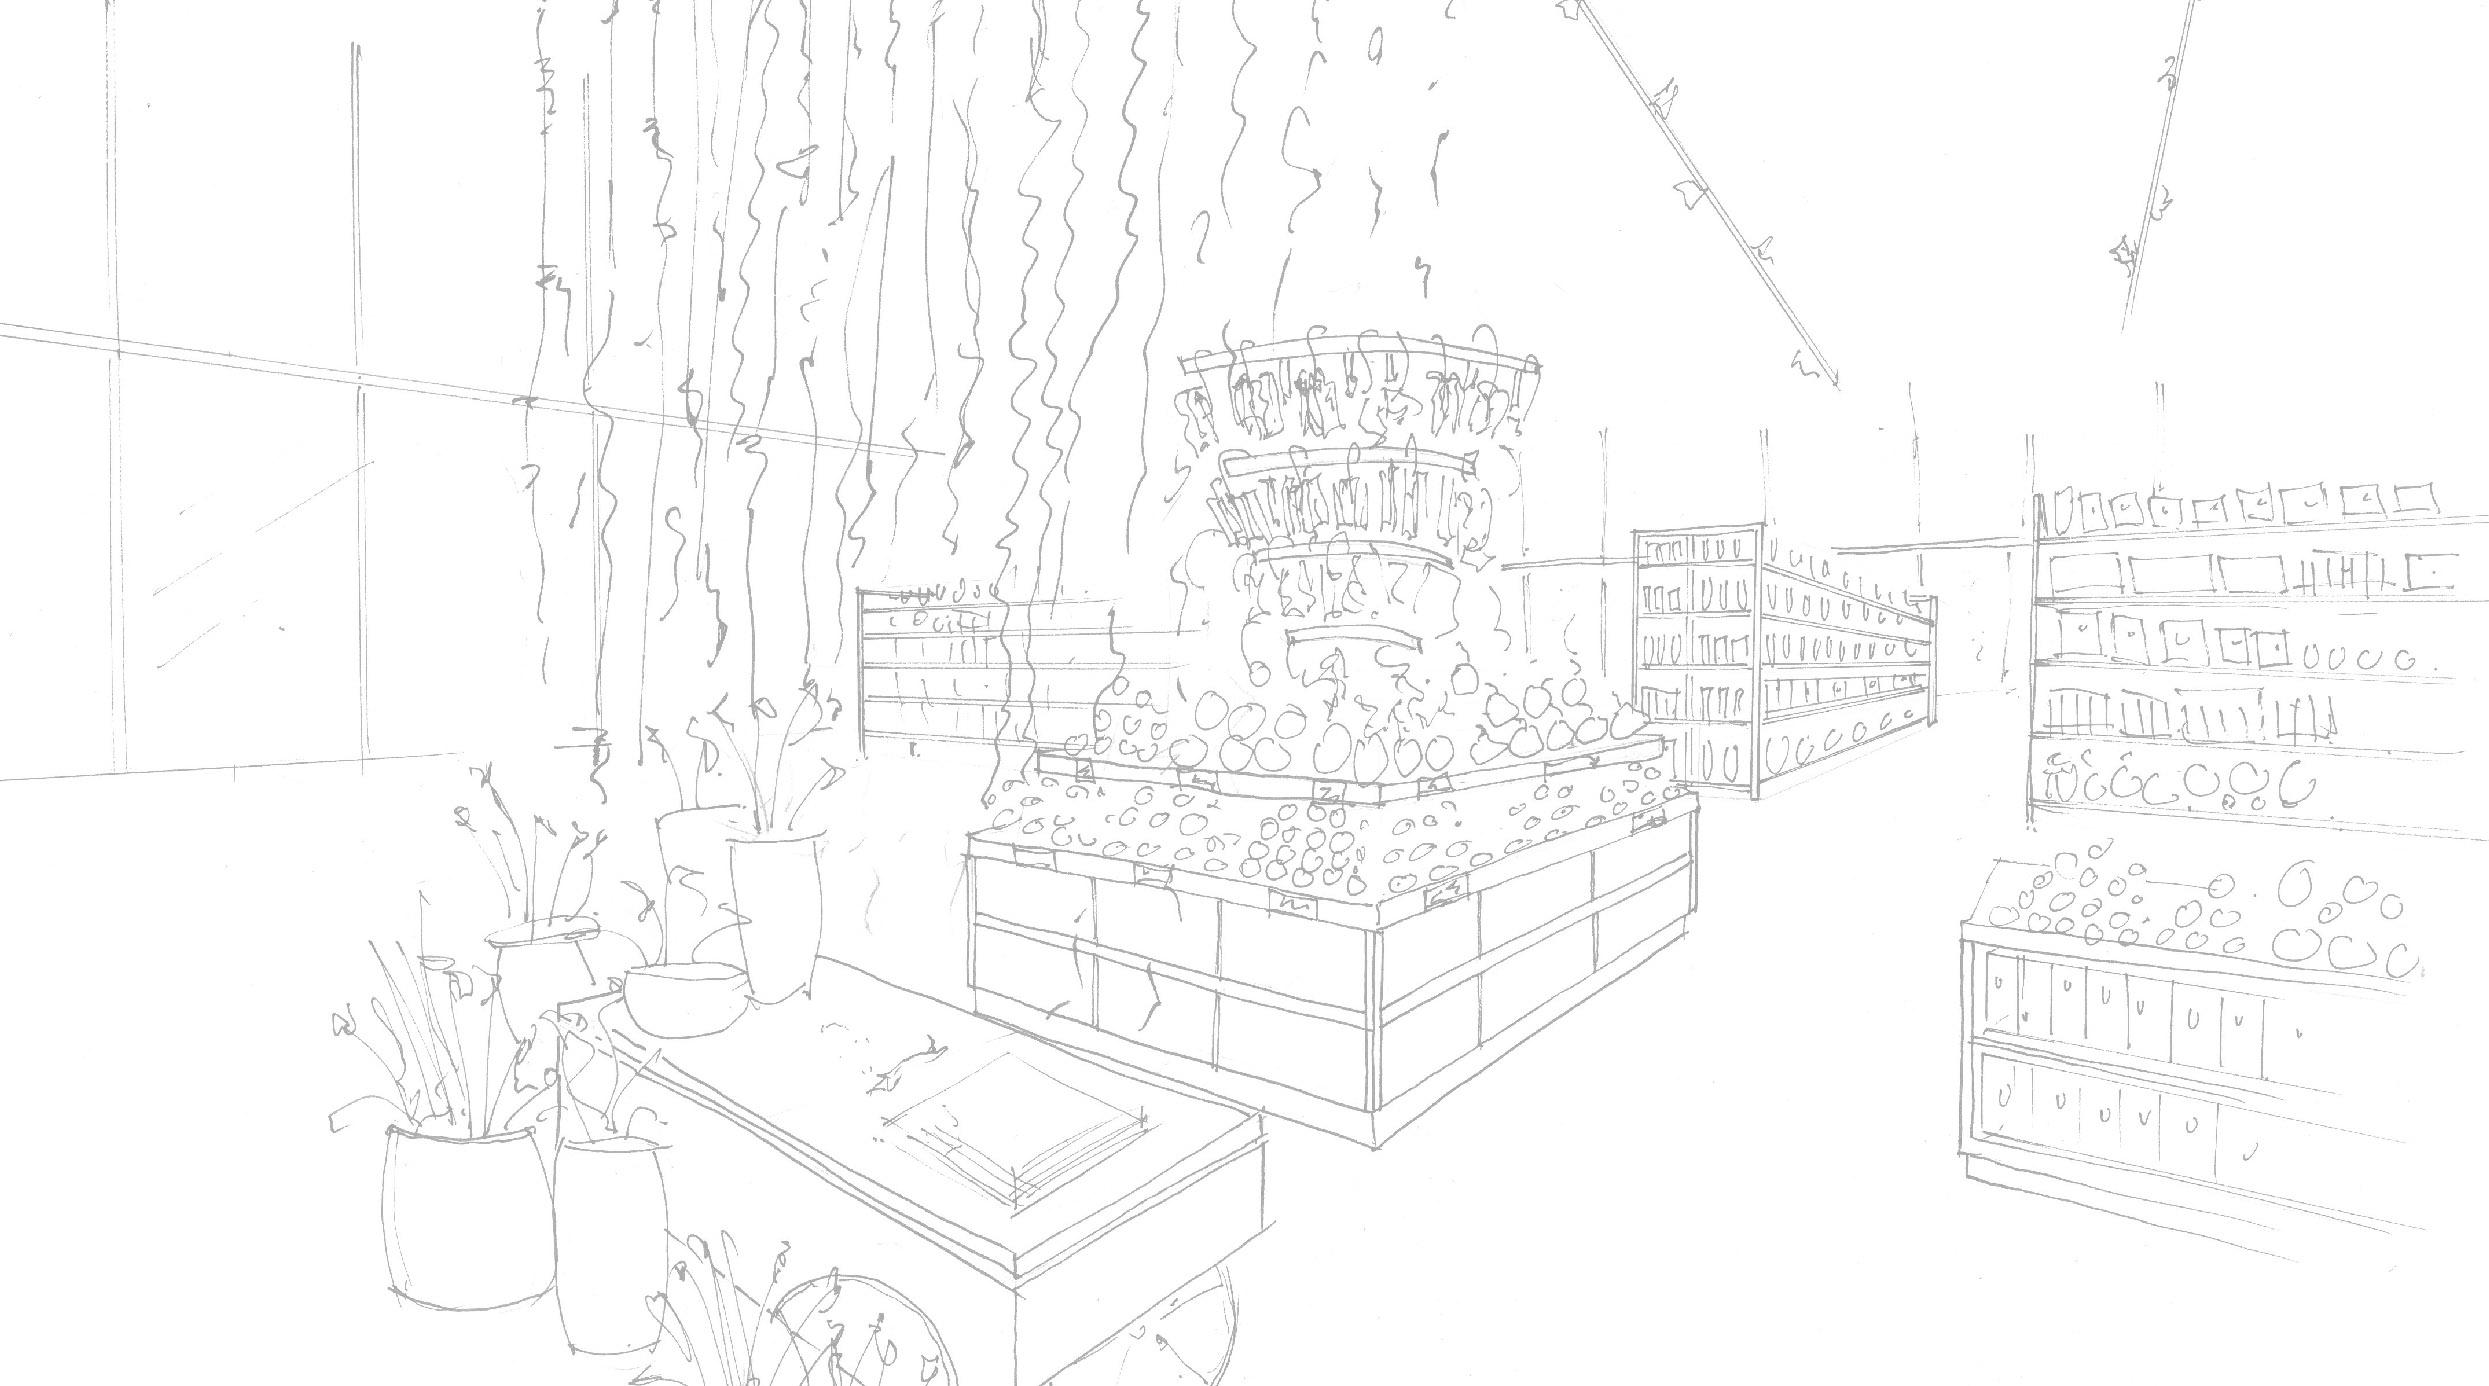 Convenient Store Sketch